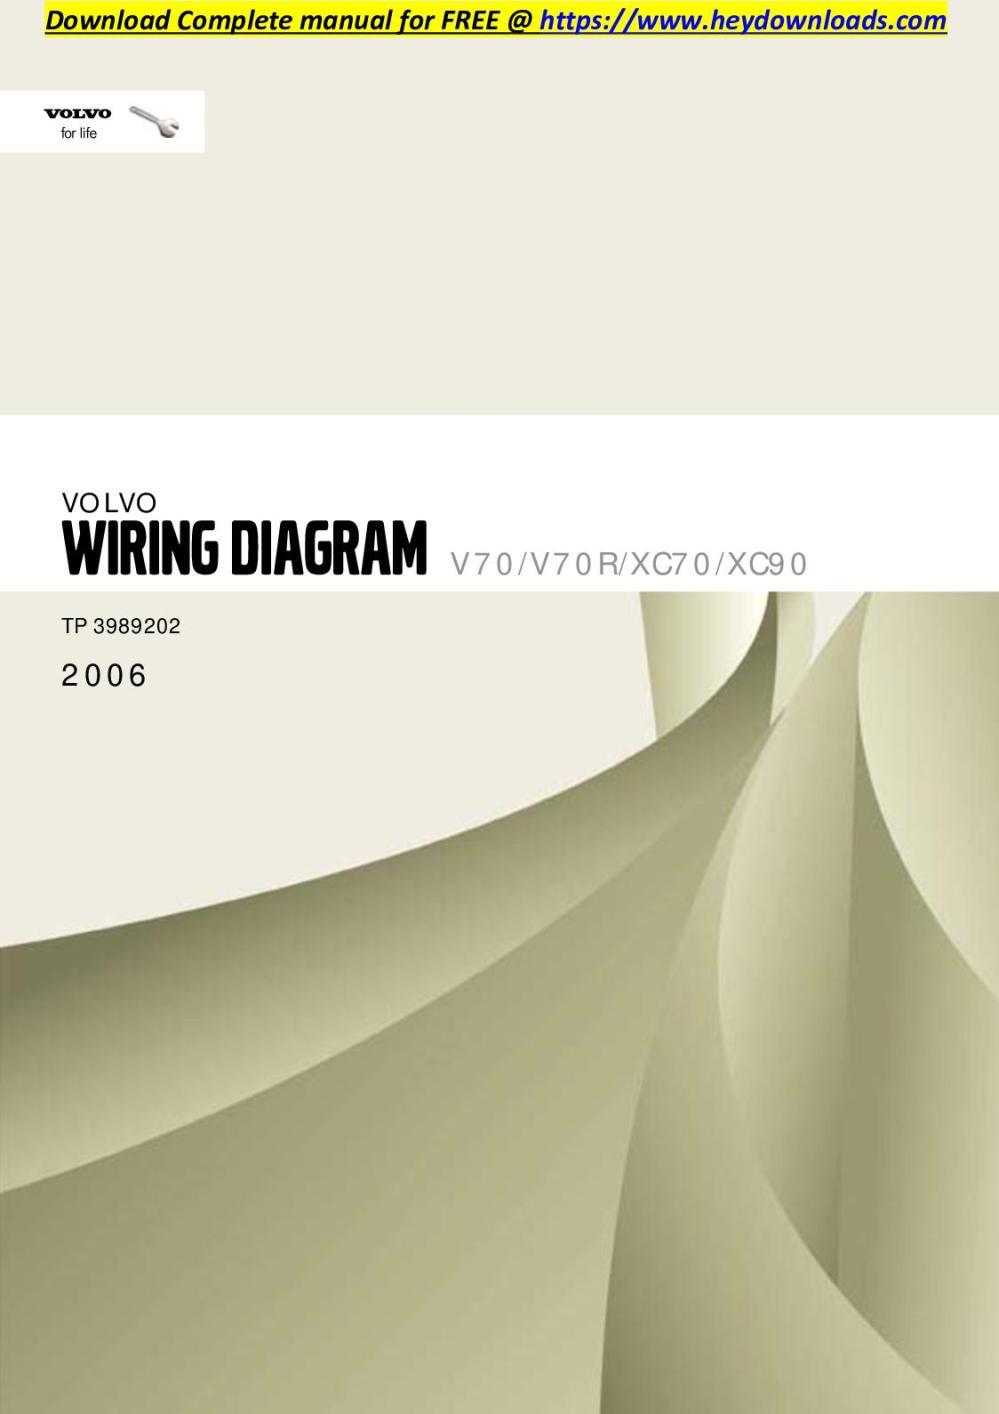 medium resolution of calam o volvo xc70 2006 v70 v70r xc70 xc90 wiring diagram volvo xc90 audio wiring diagram volvo xc90 wiring diagram